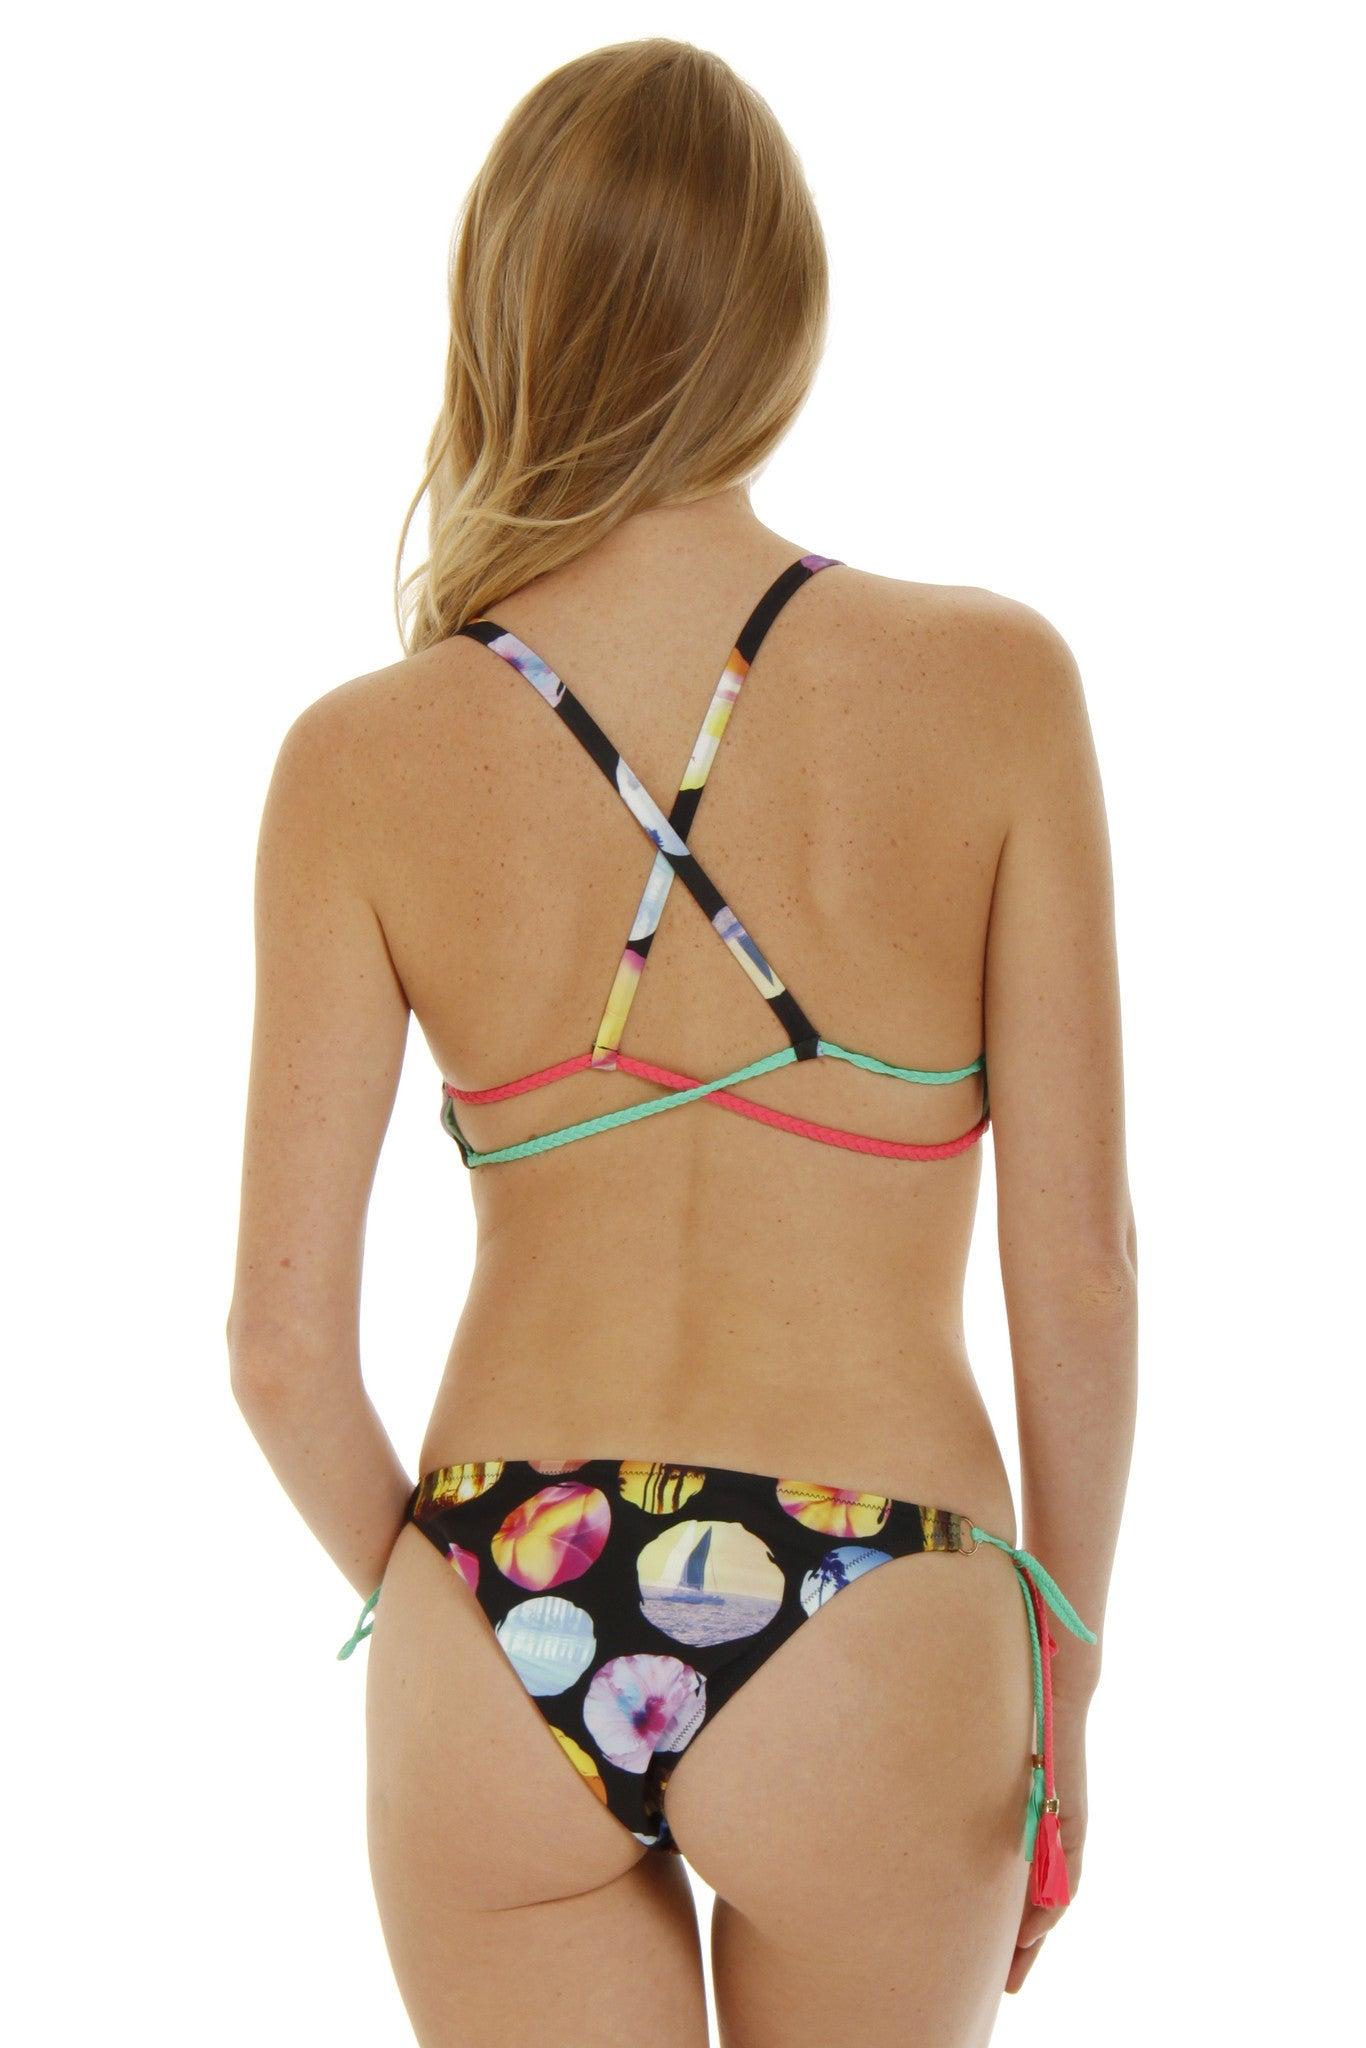 RAISINS Starstruck Scoop Neck Bikini Top - Cali Coast Print Bikini Top | Cali Coast Print| Starstruck Scoop Neck Bikini Top - Cali Coast Print. Back View. Crossed Straps in the back for pull over wear. Scoop Neck.